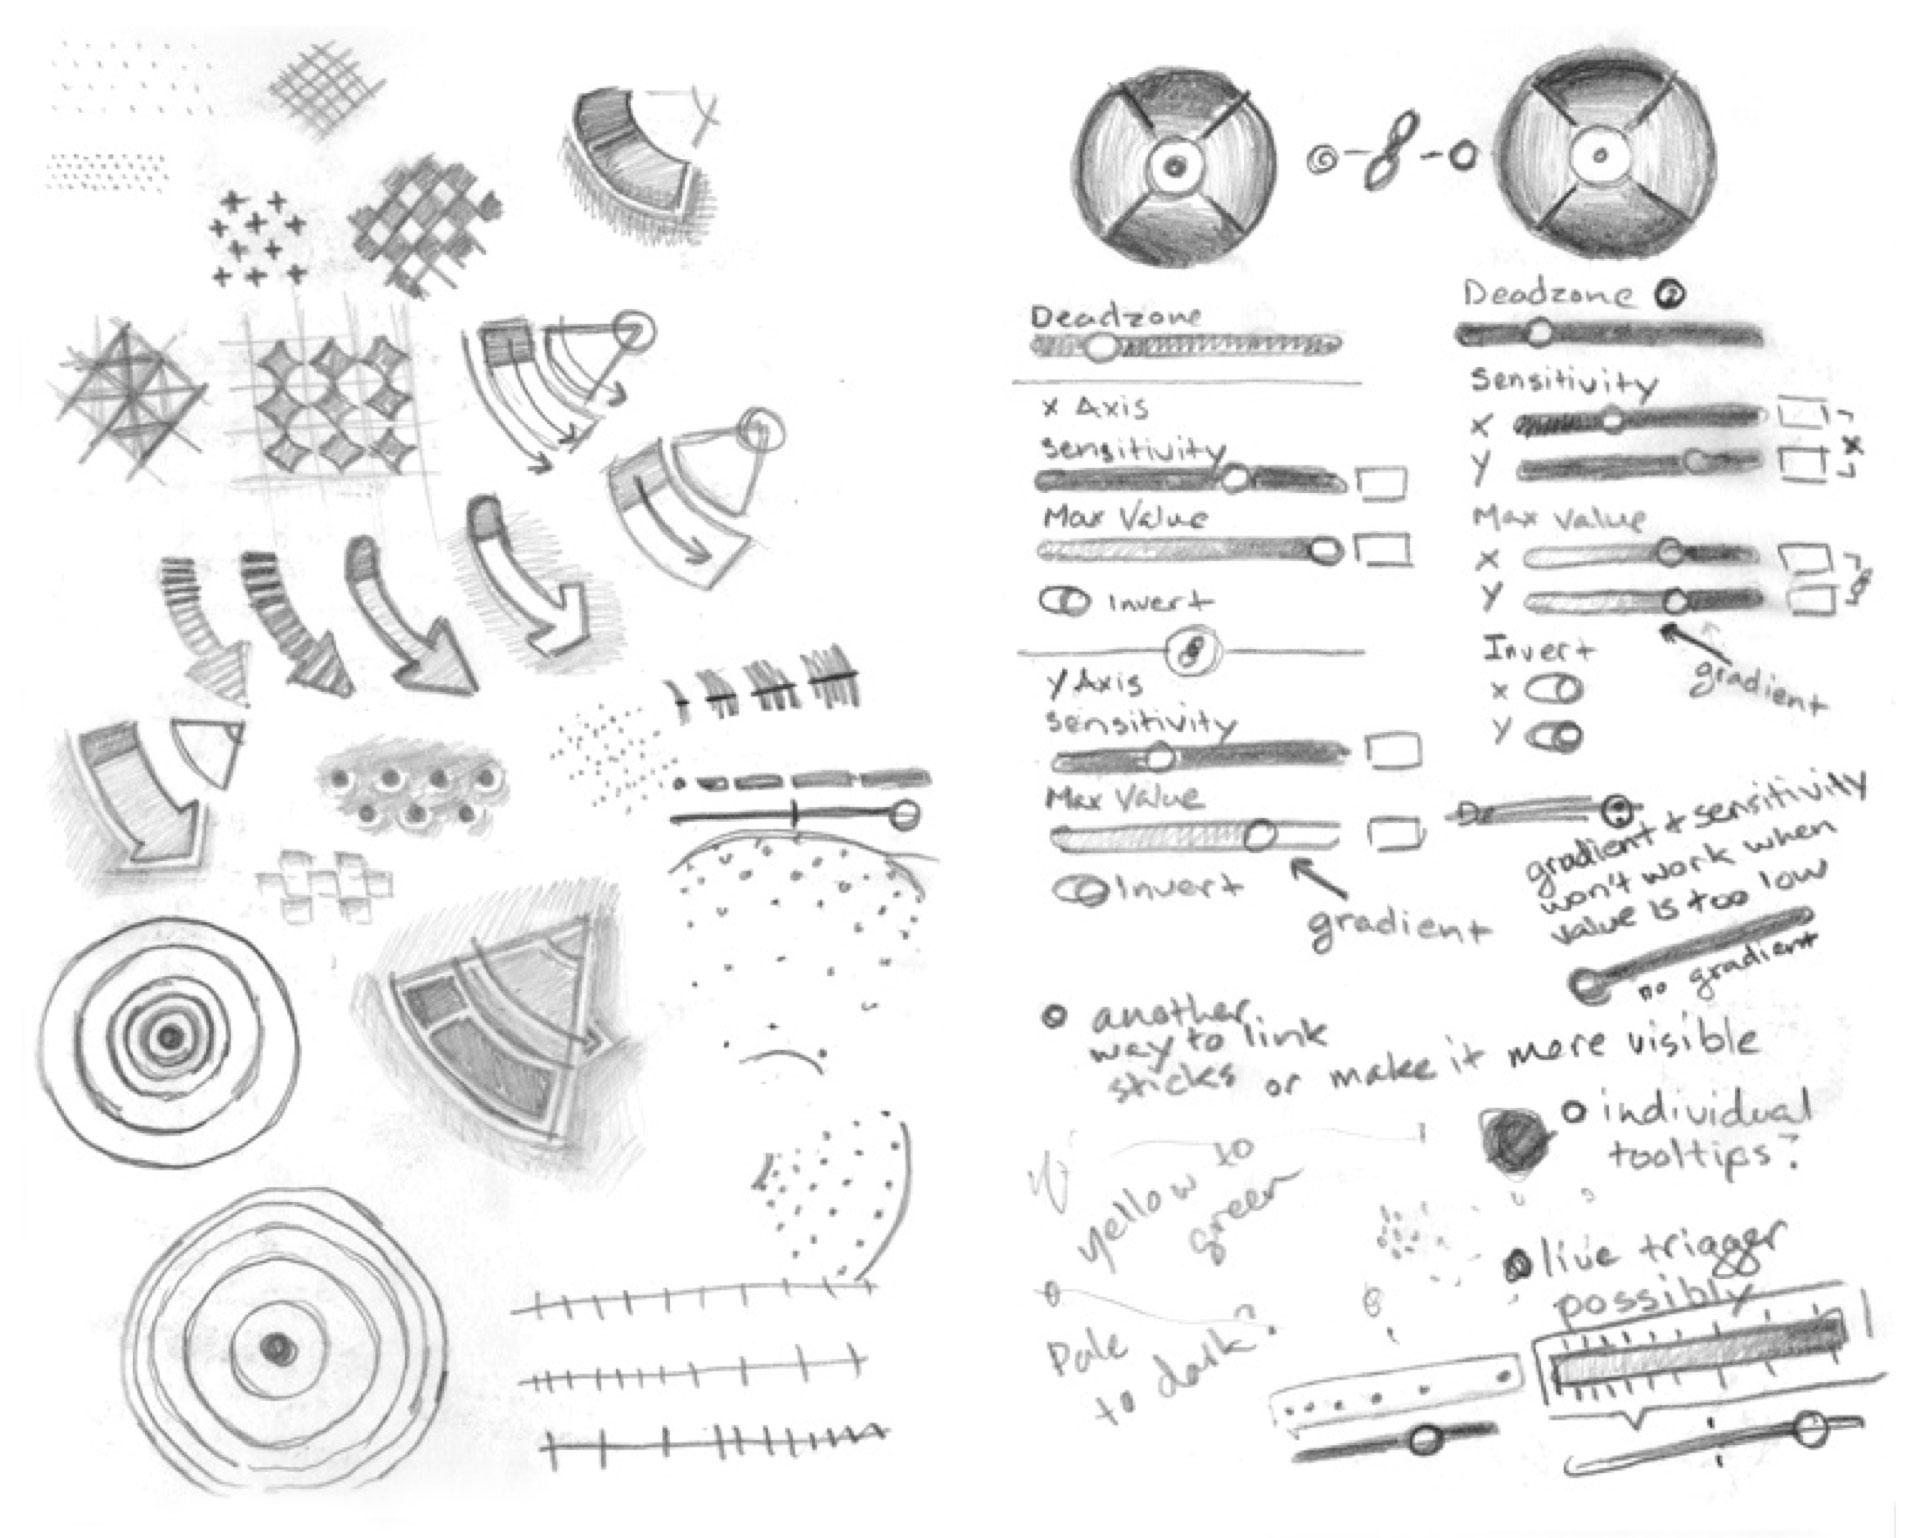 stratus-sketches-2.jpg